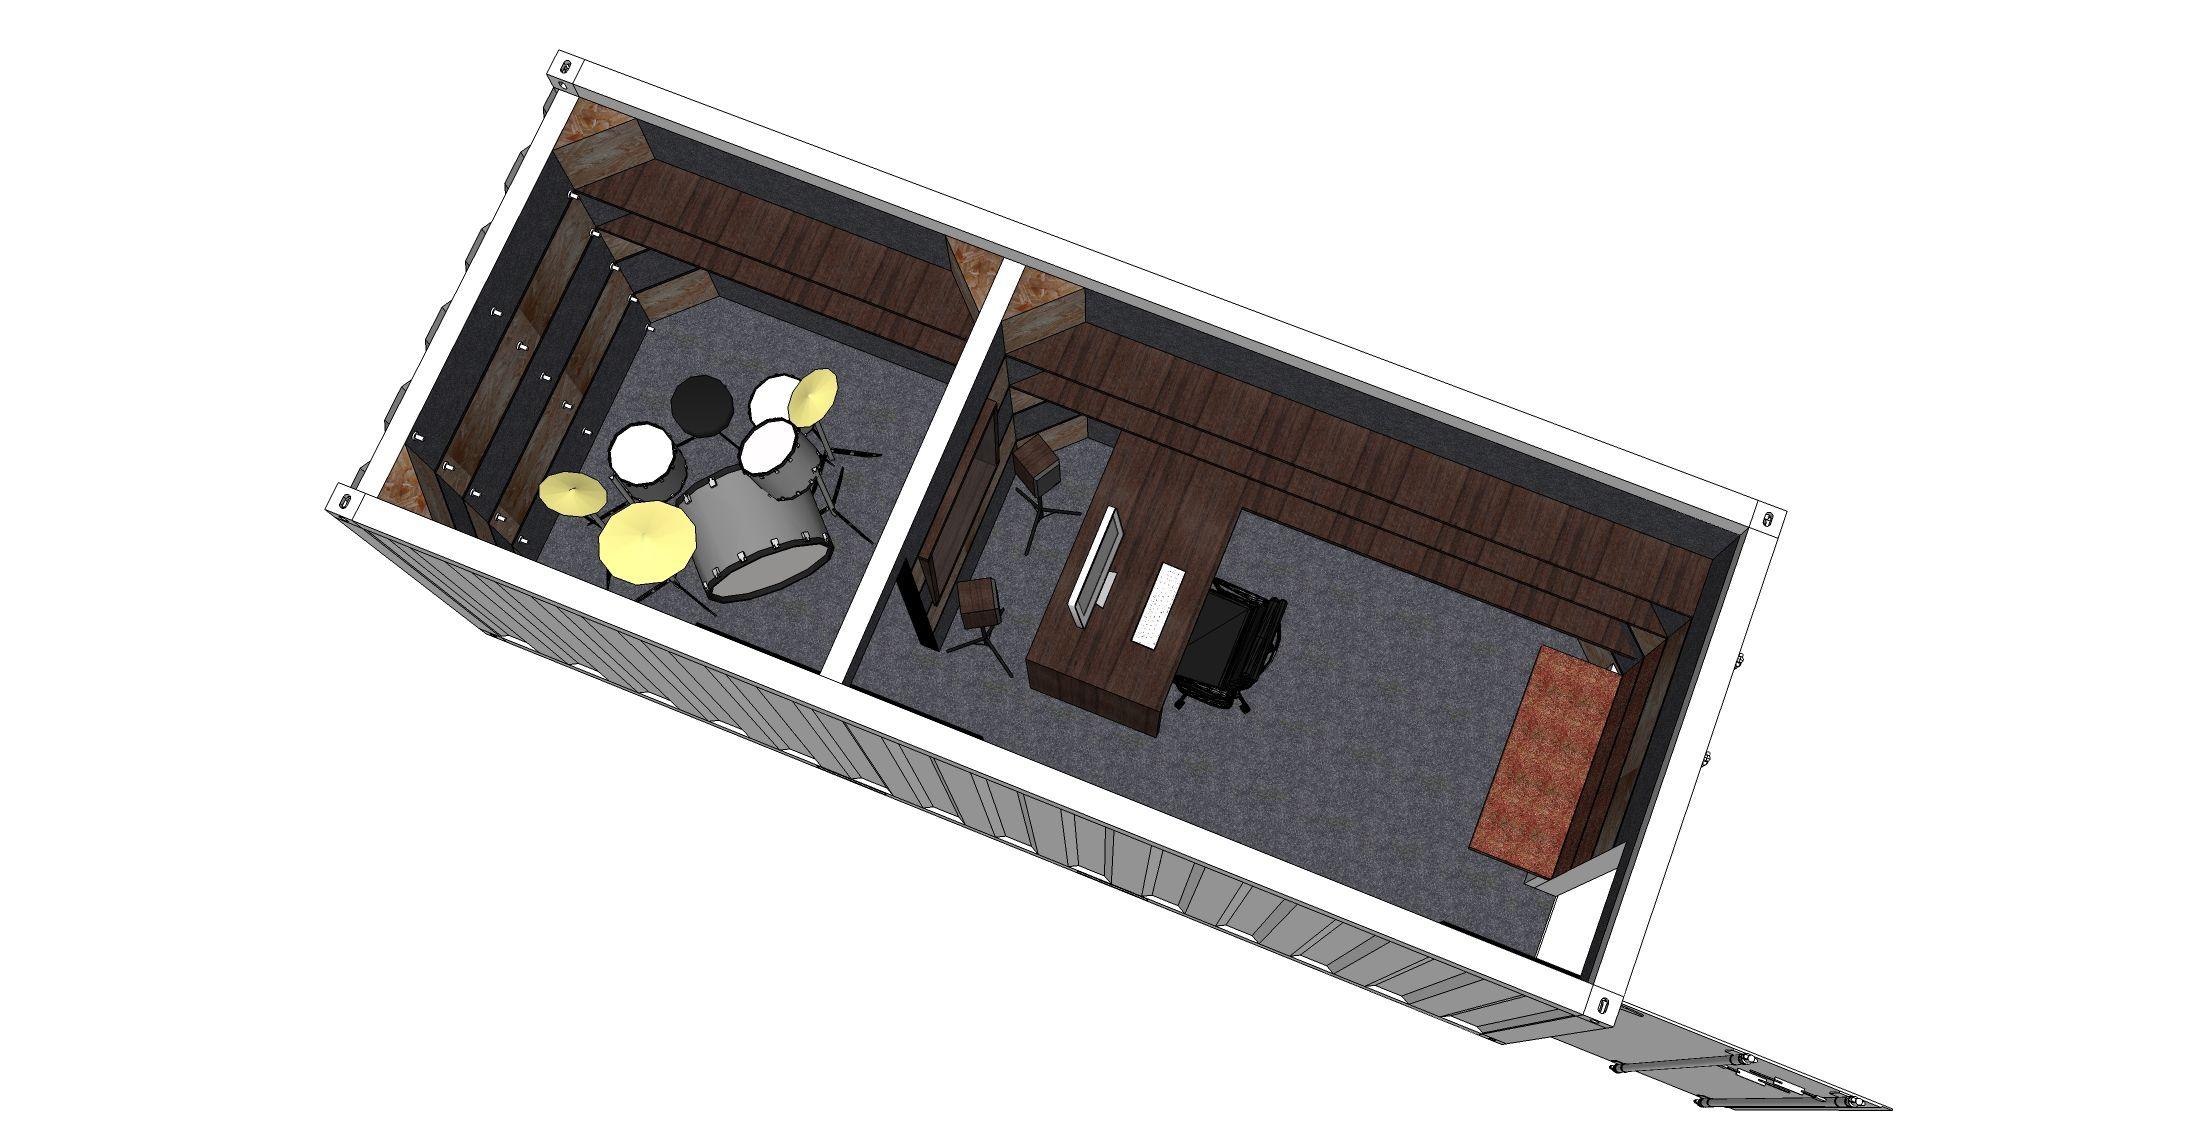 container recording studio 2 200 1 145 pixels container pinterest recording studio. Black Bedroom Furniture Sets. Home Design Ideas